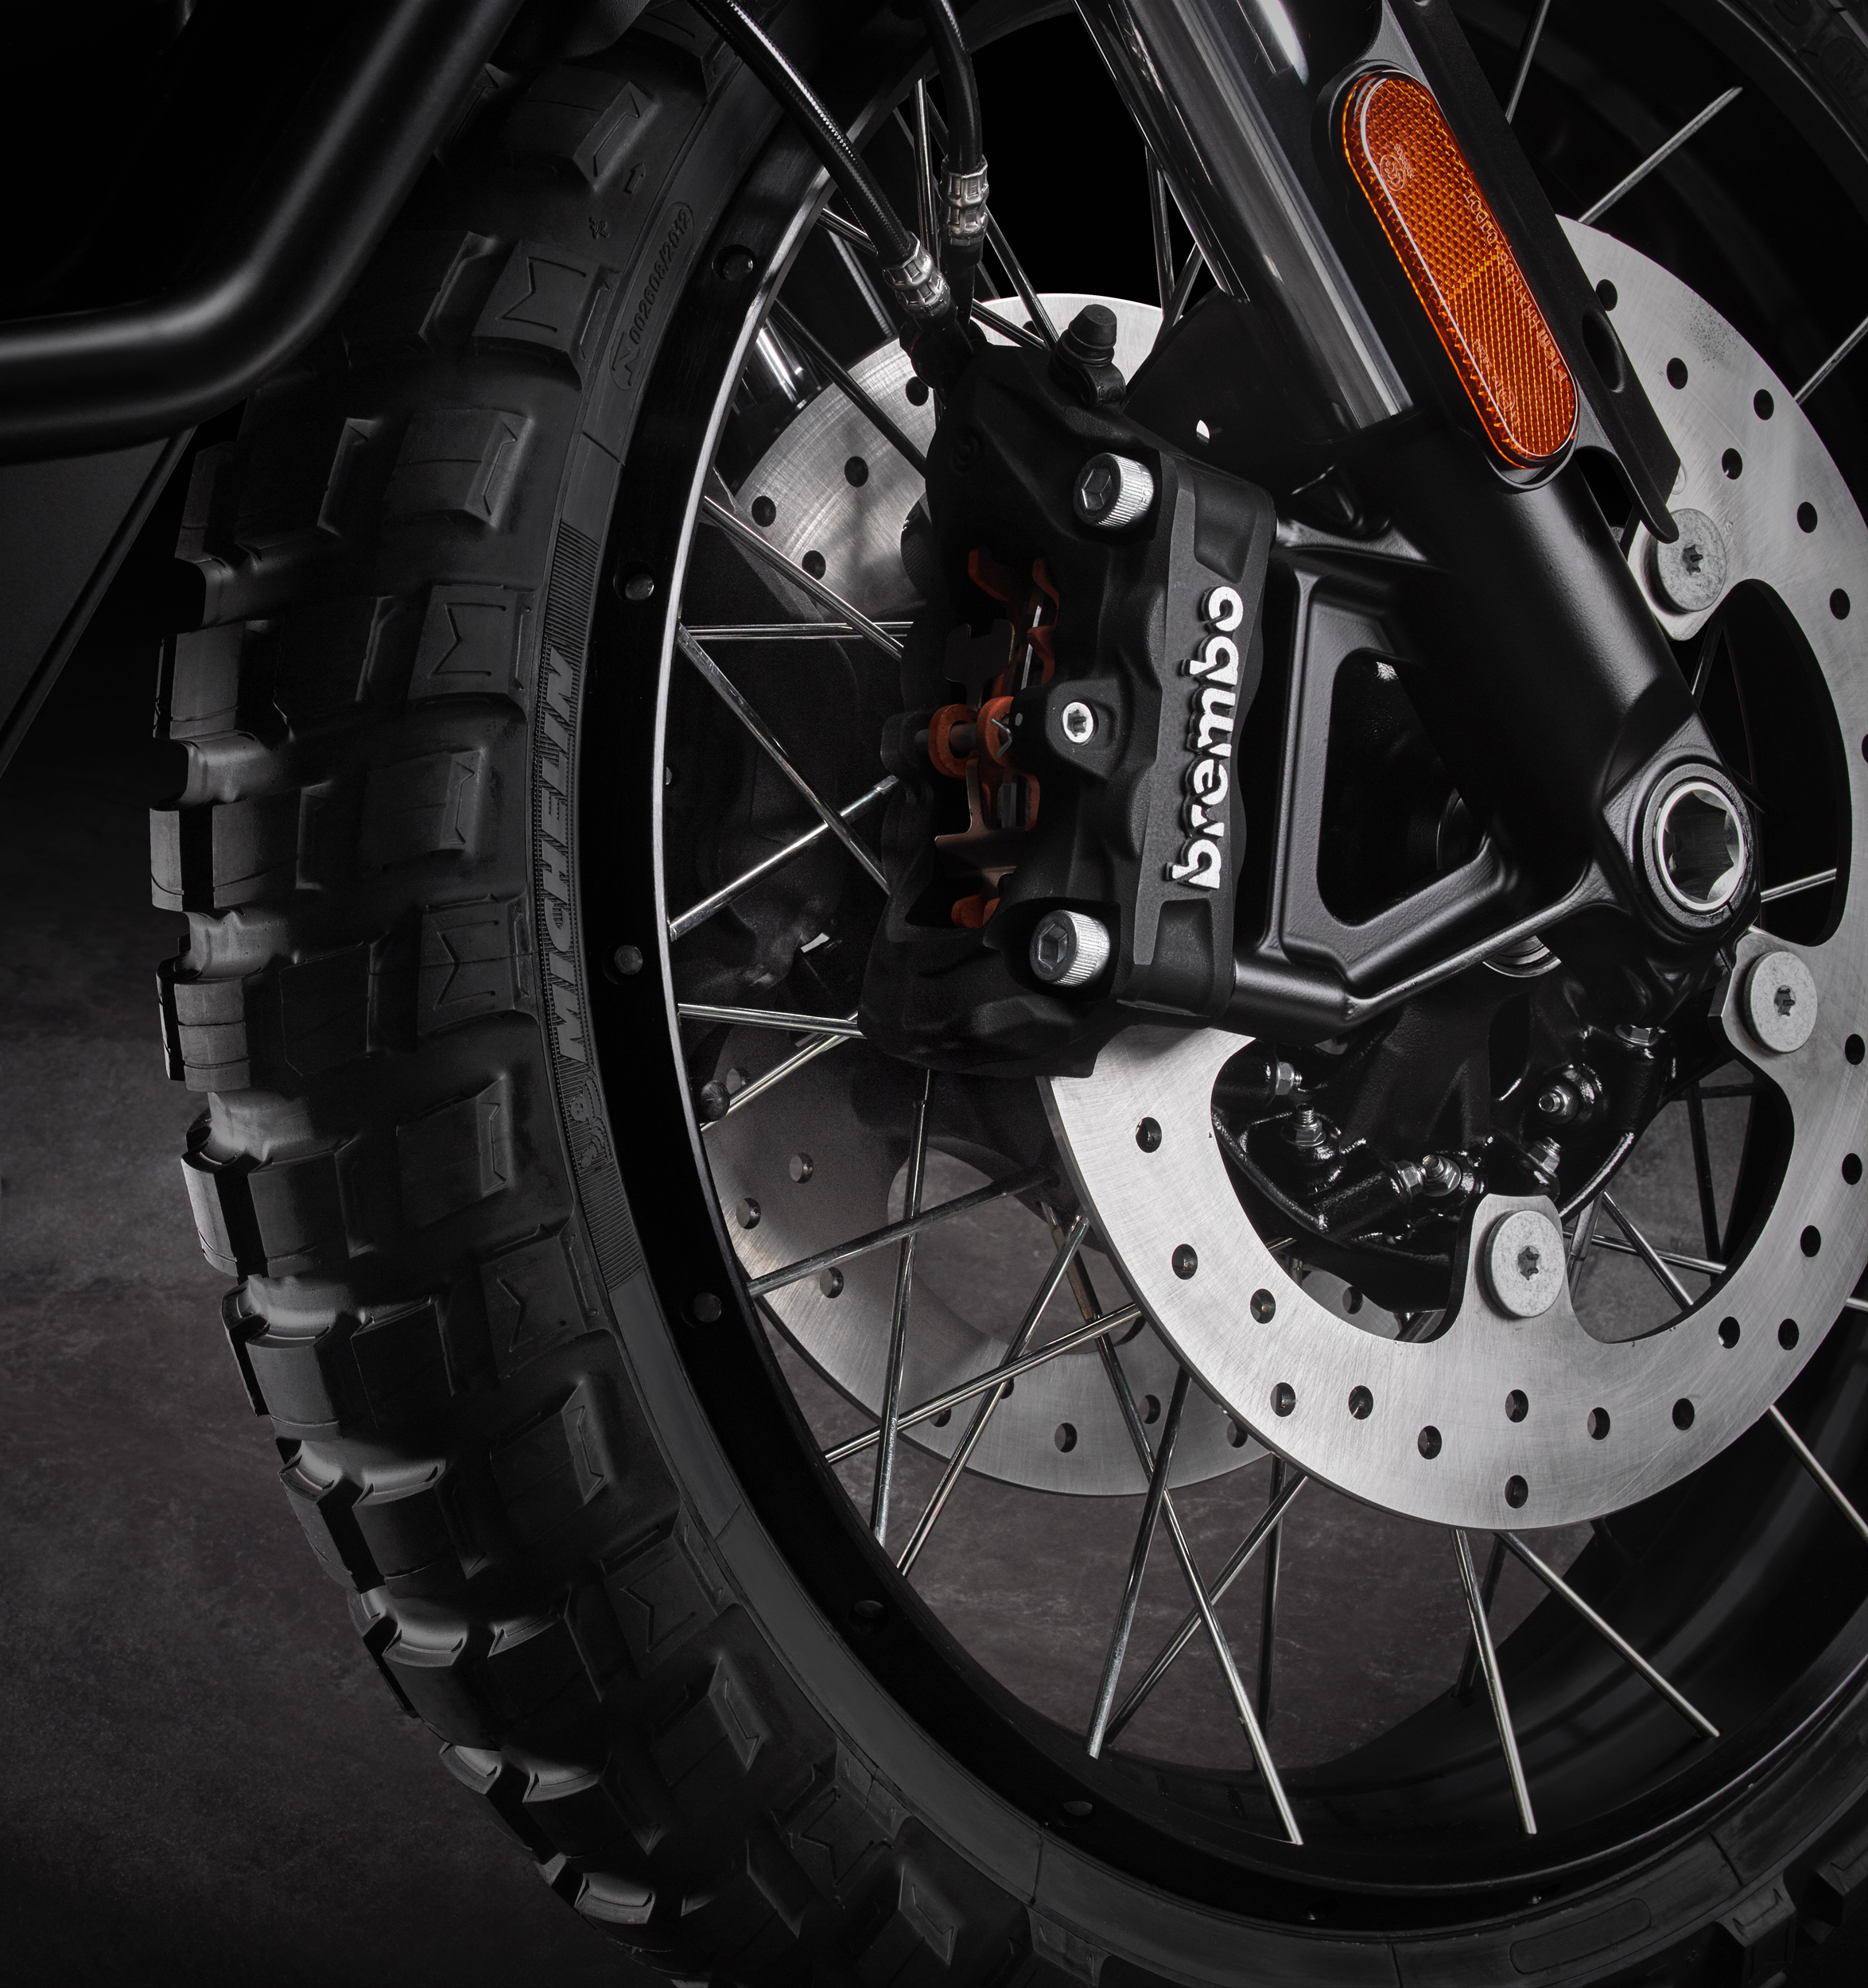 Braking and Tires